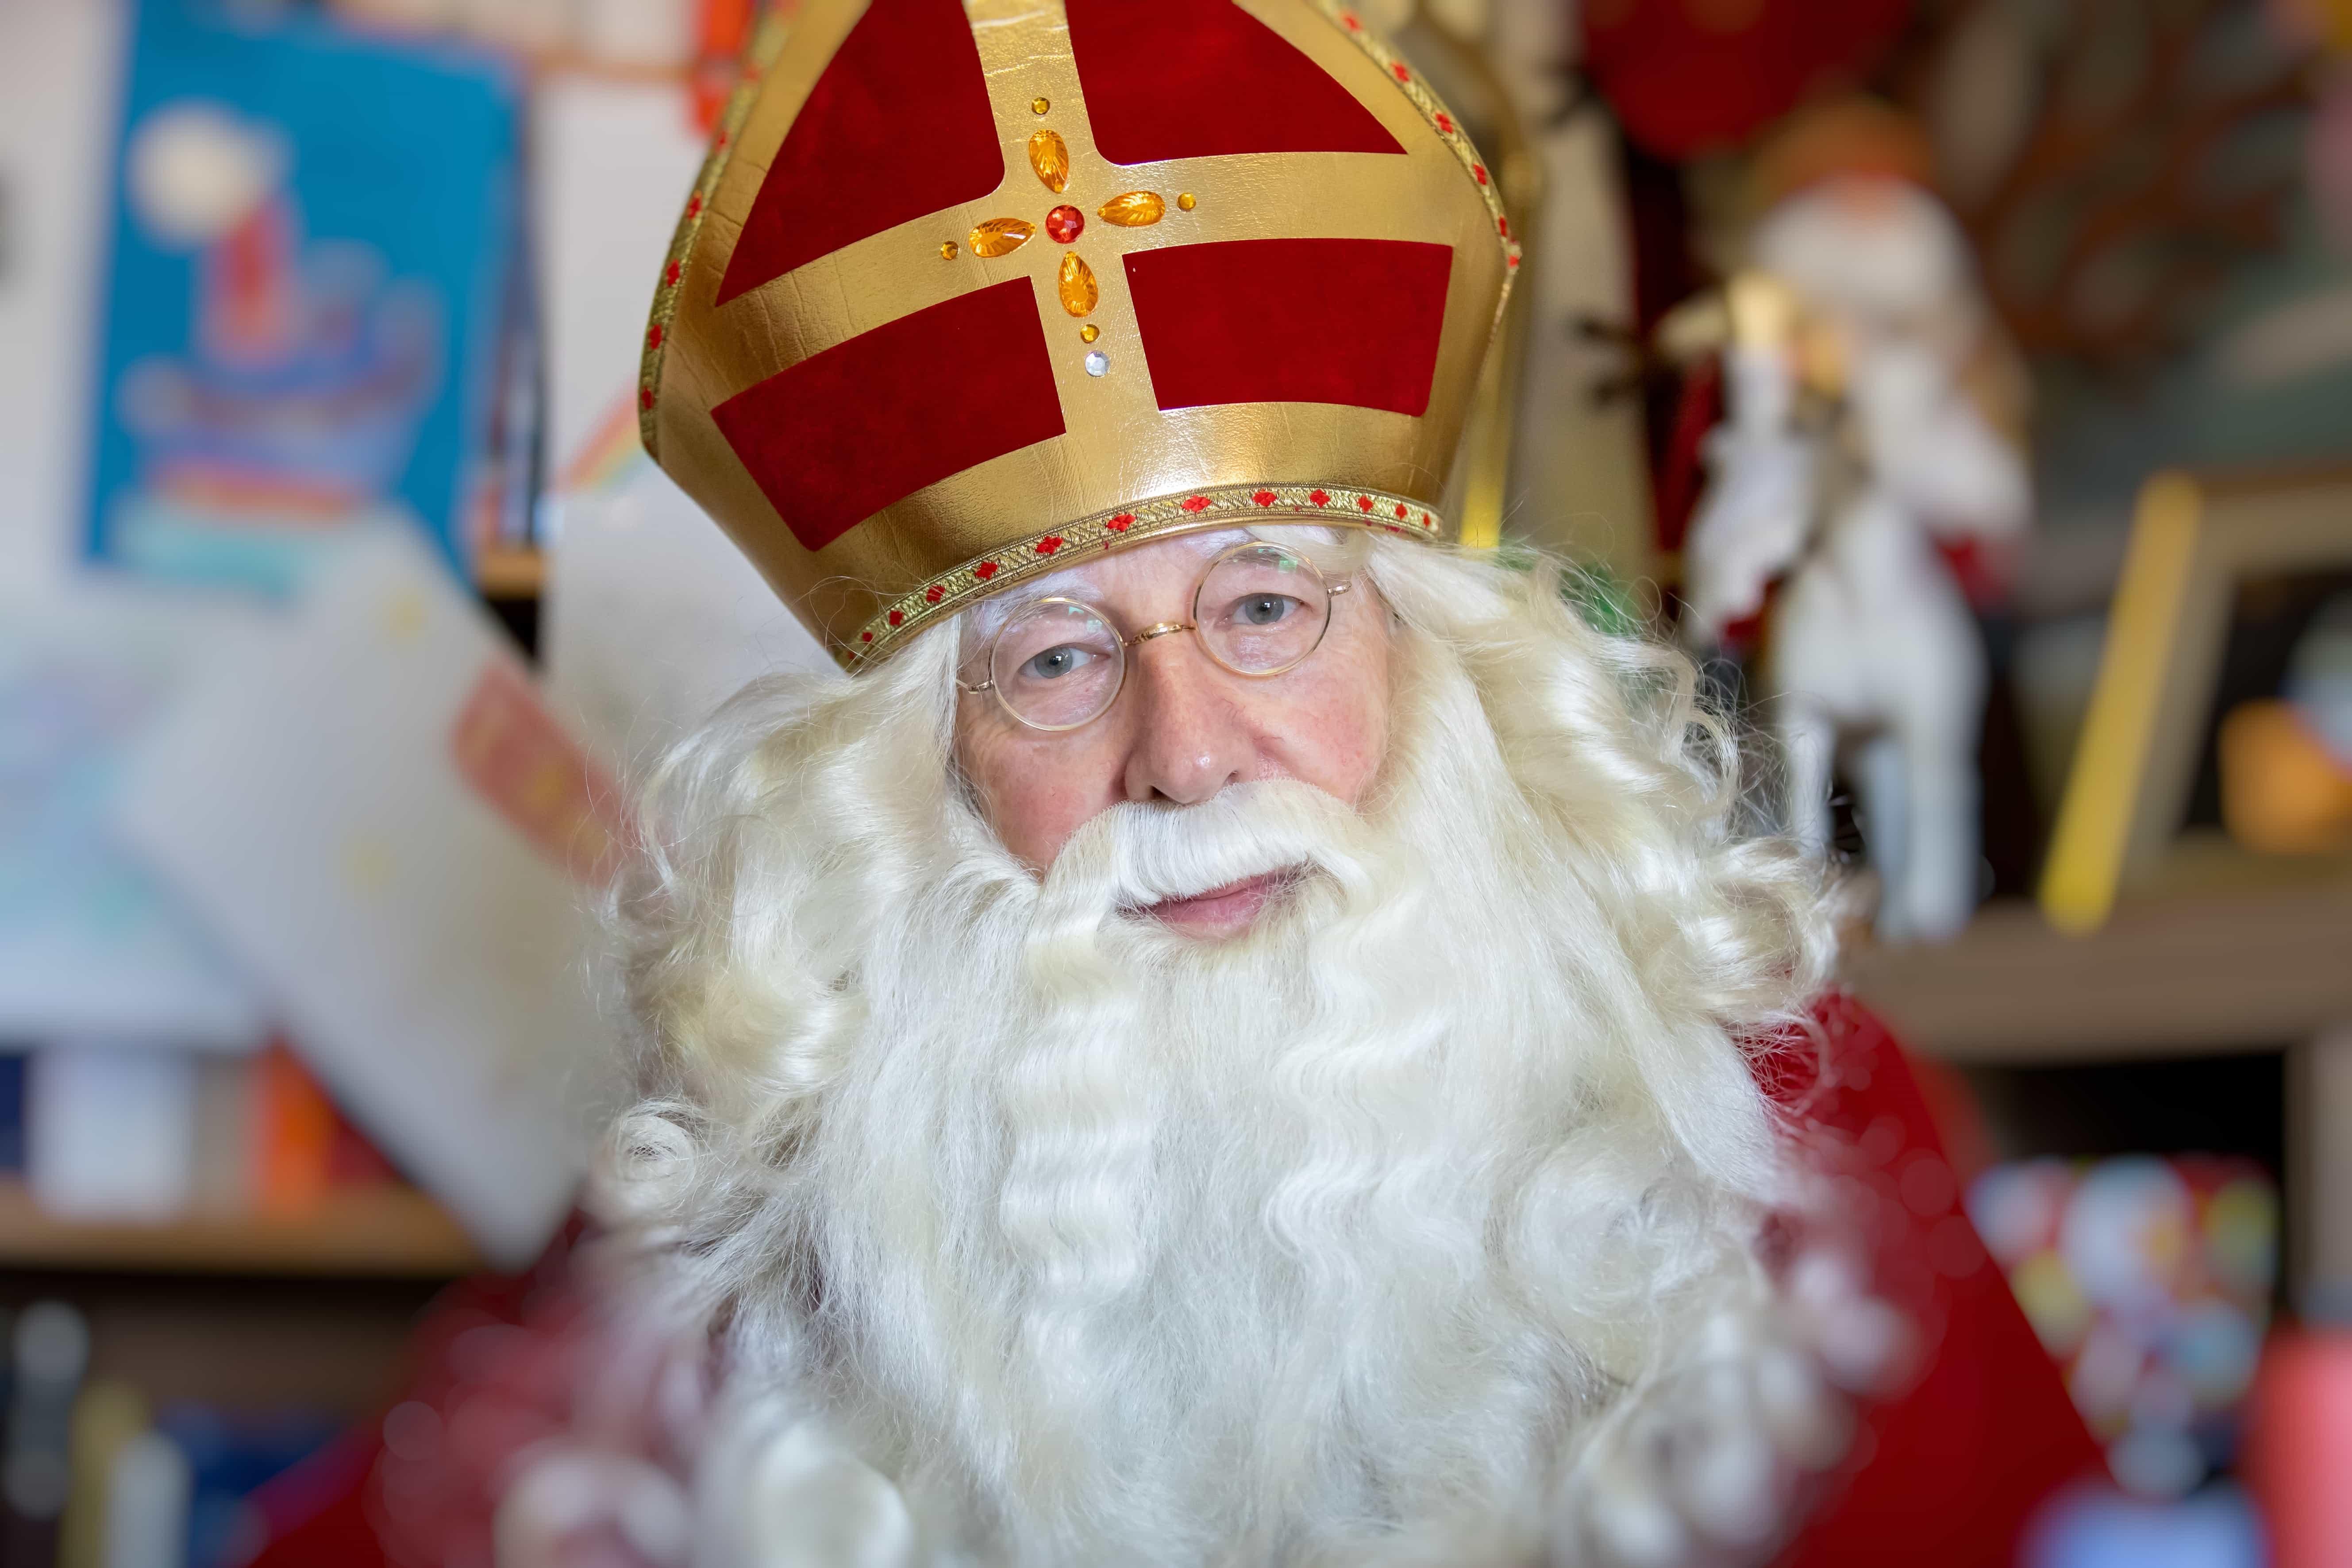 Kleurplaat Sinterklaas aan de Maas